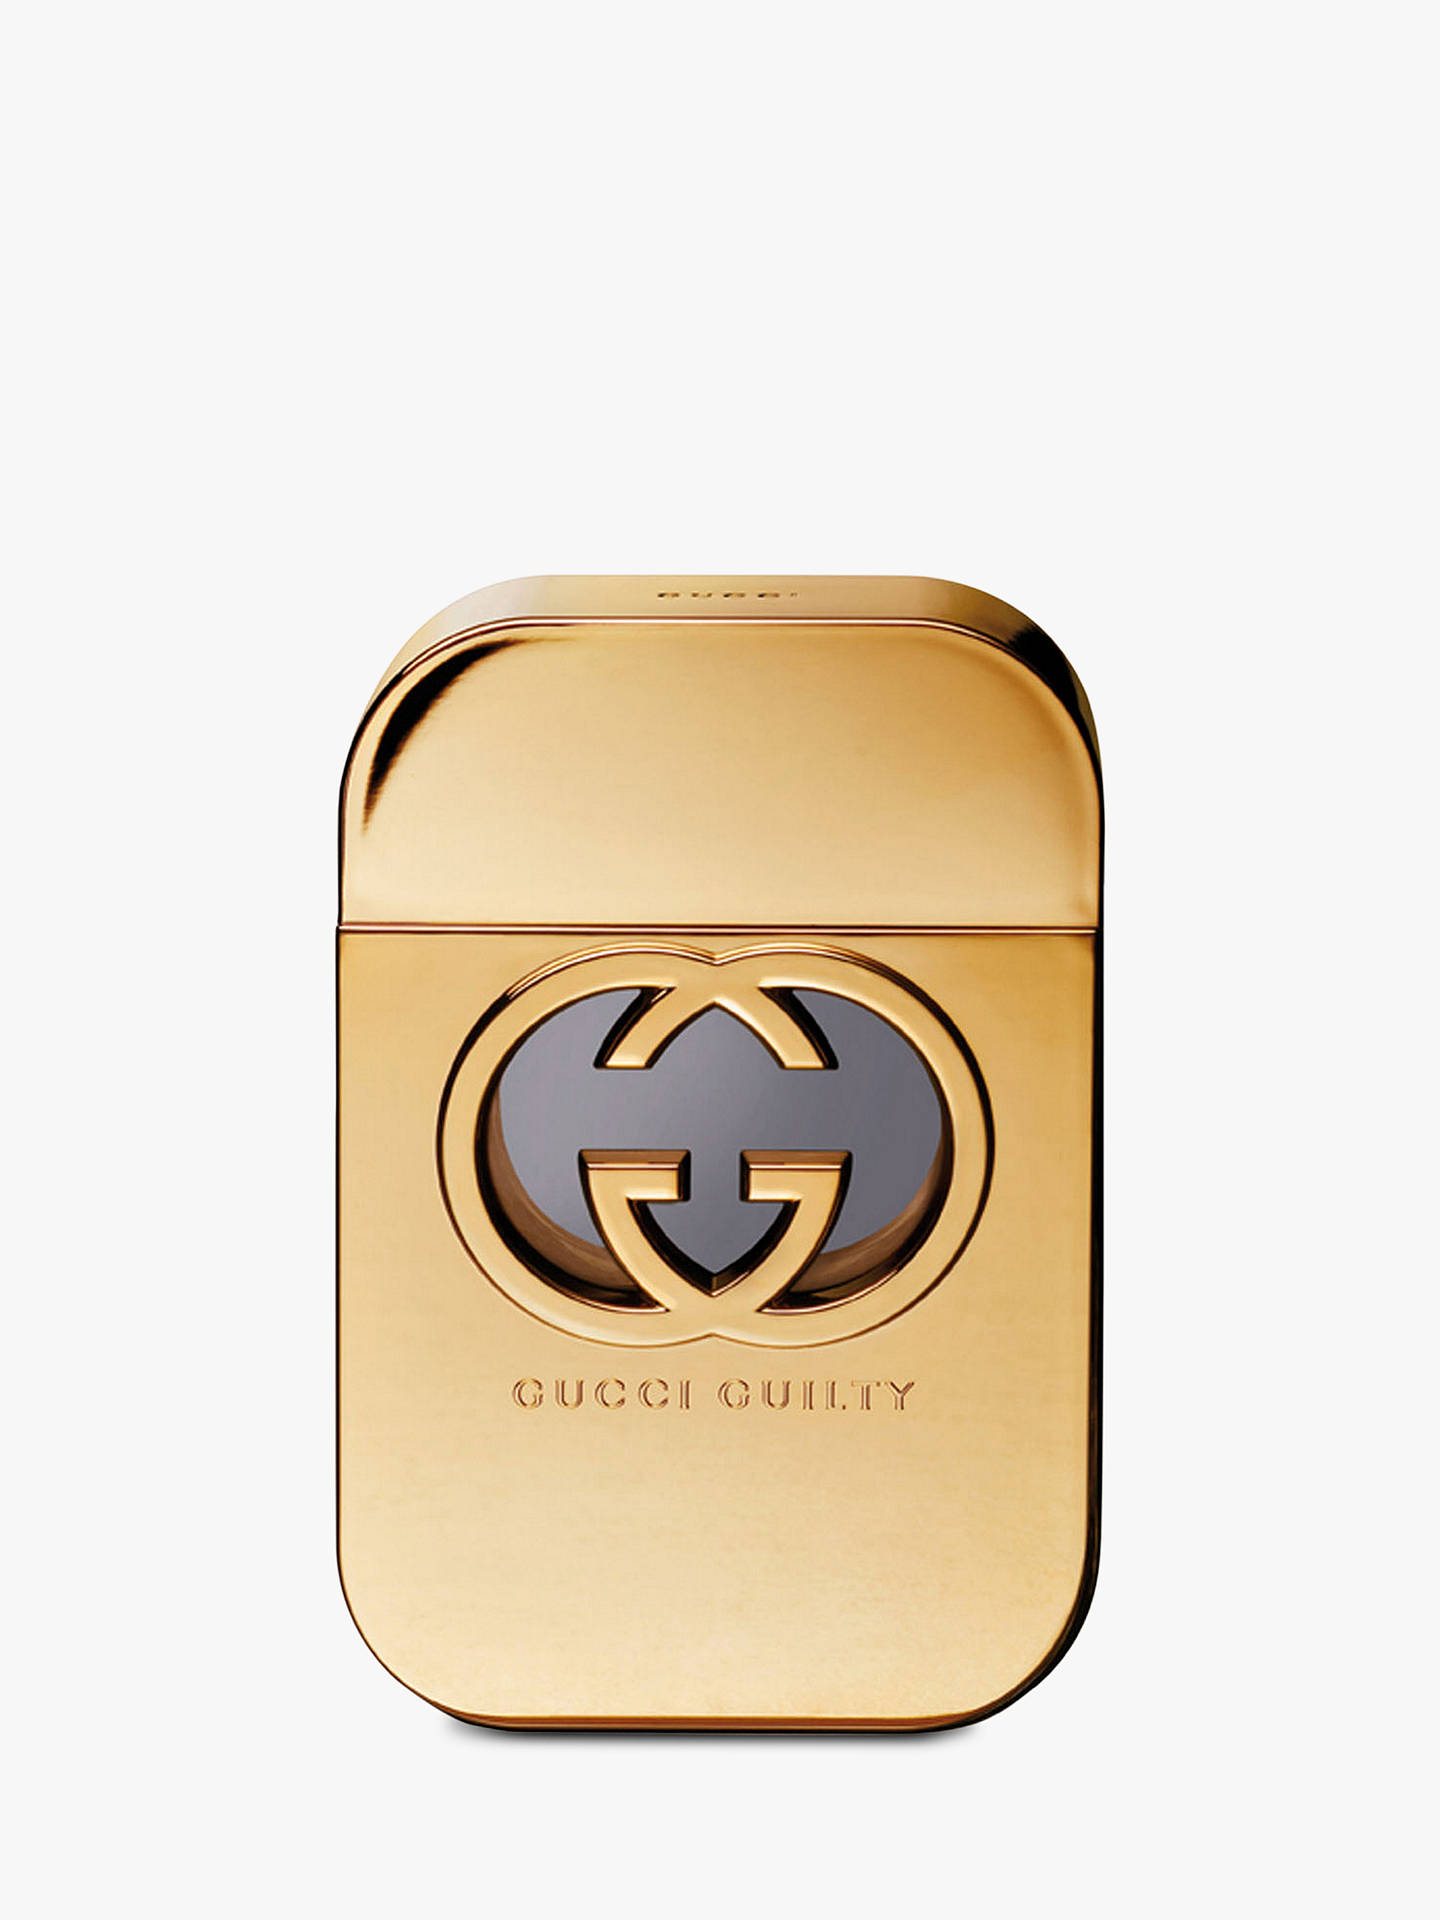 5c8a9d4708 Homepage · Beauty · Women's Fragrance. Buy Gucci Guillty Intense Eau de  Parfum for Her, 75ml Online at johnlewis.com